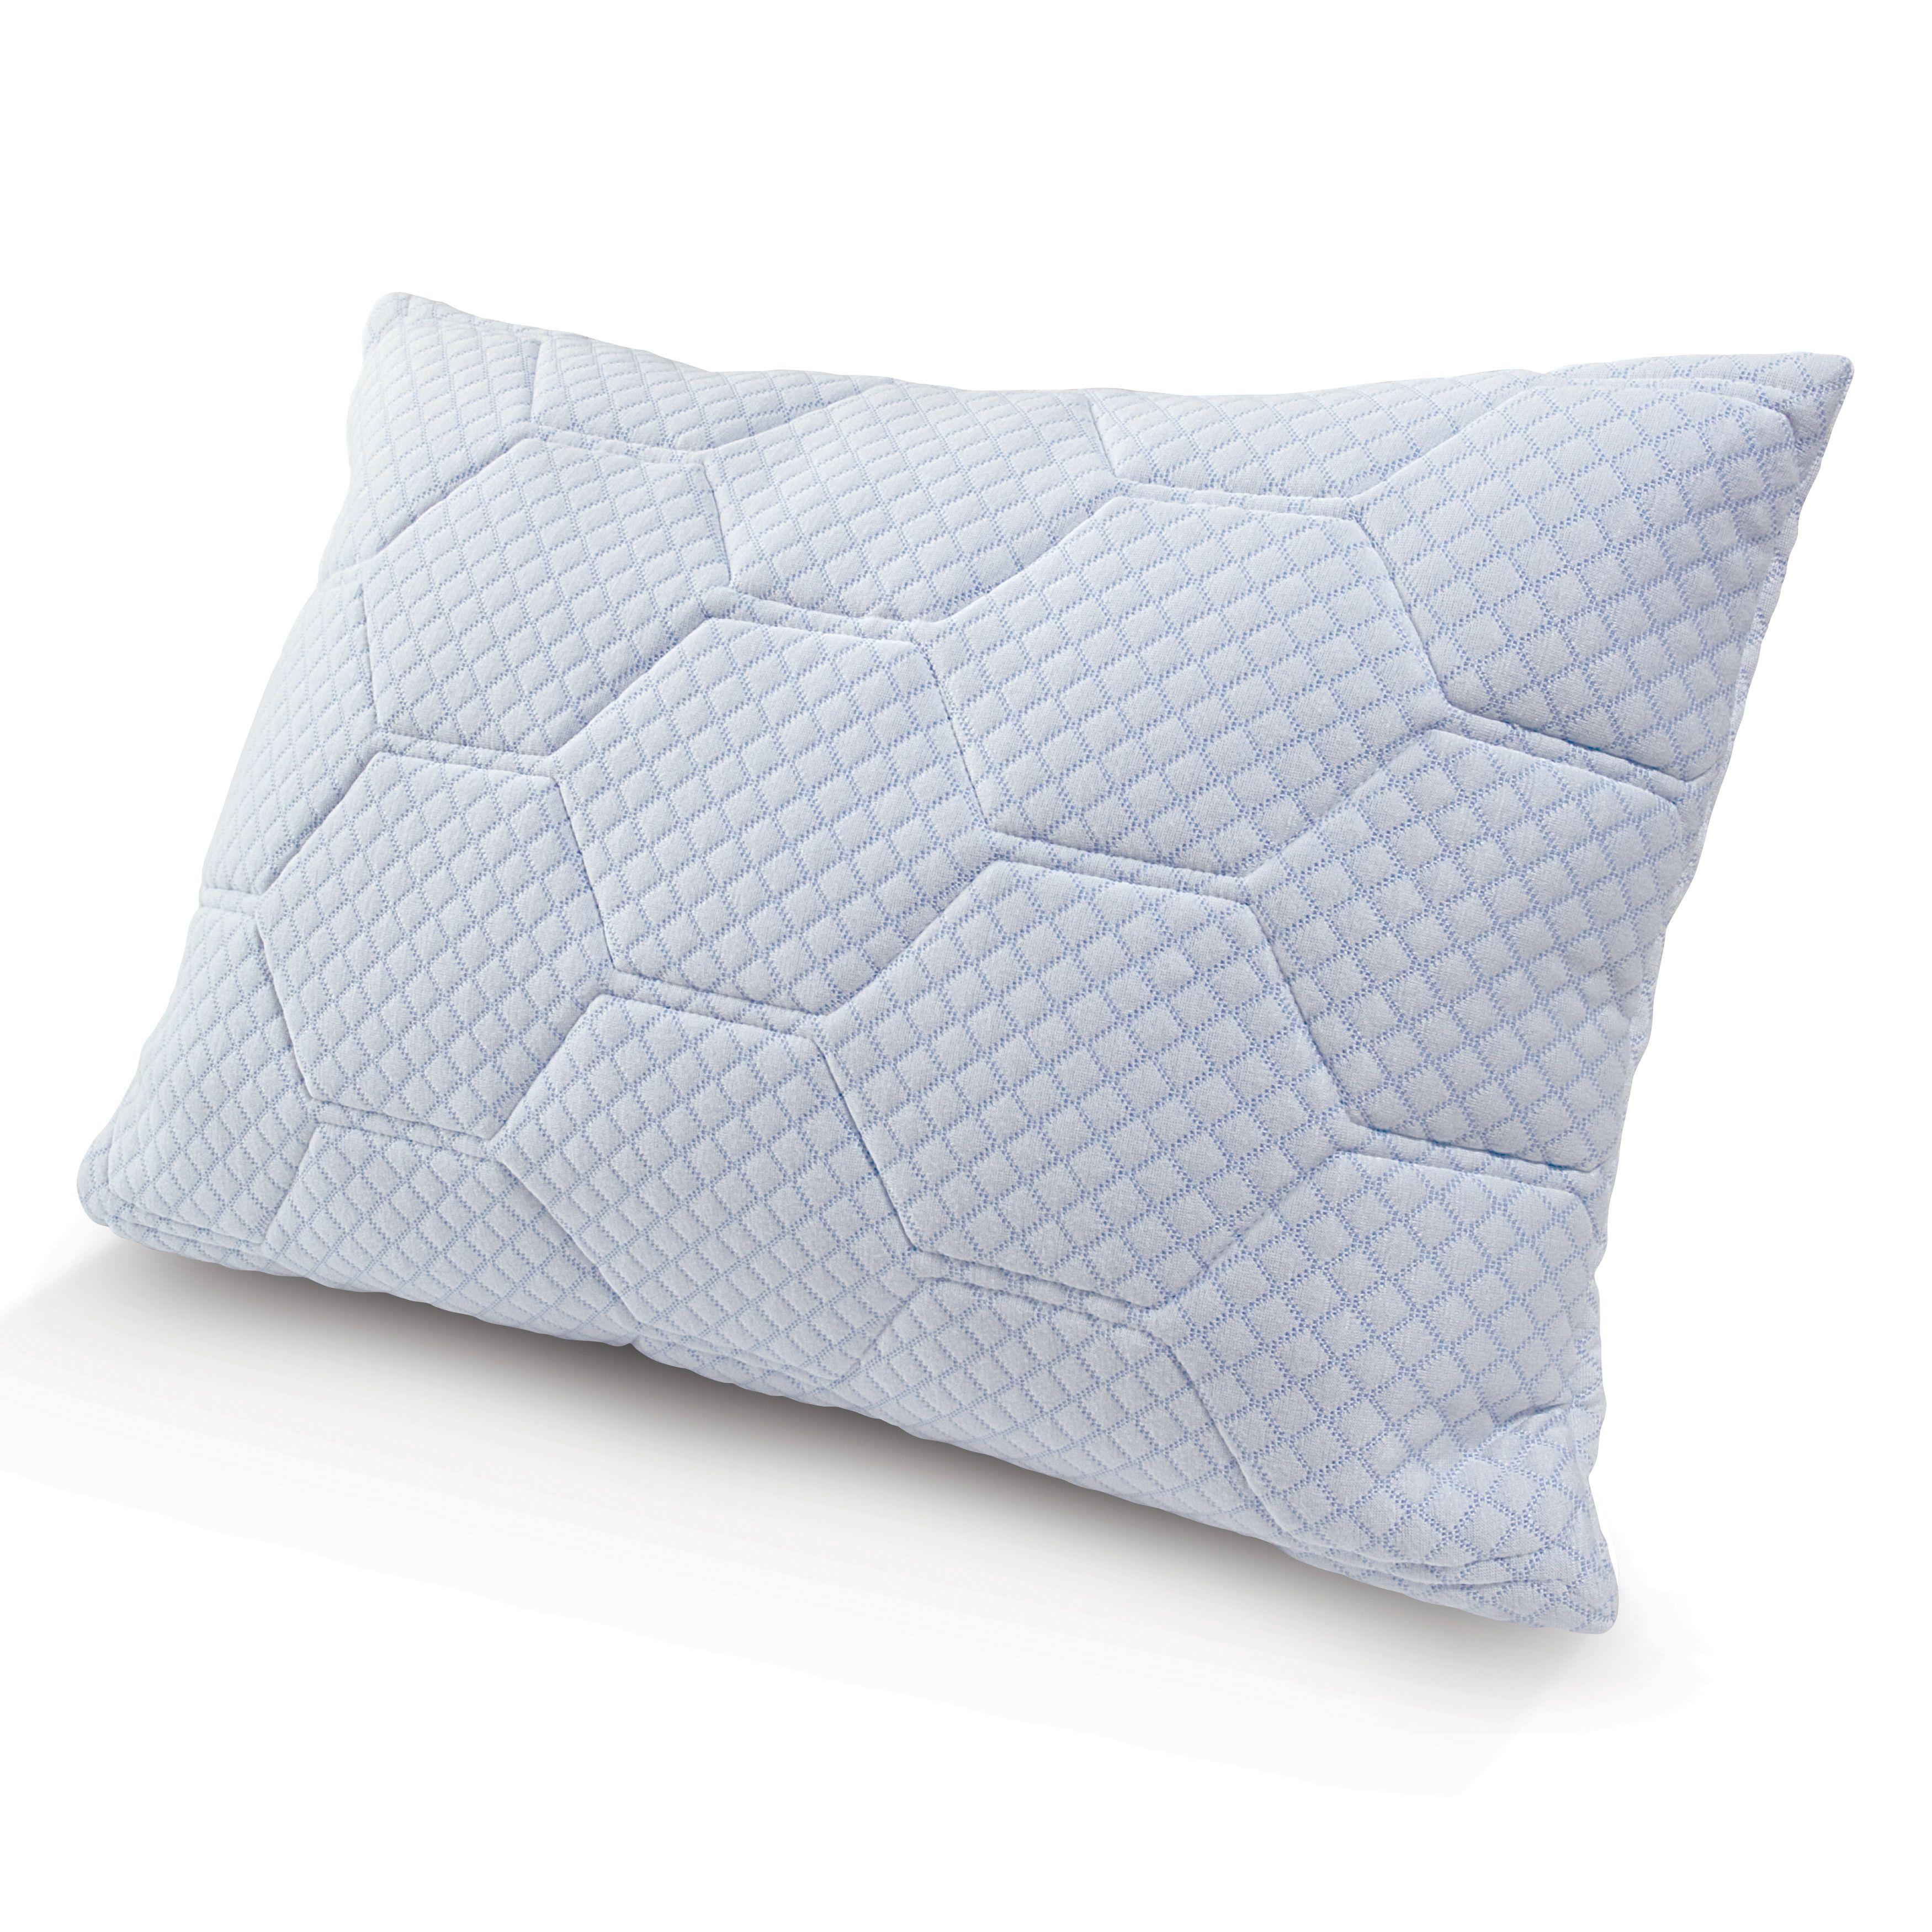 arctic sleep europedic cooling gel